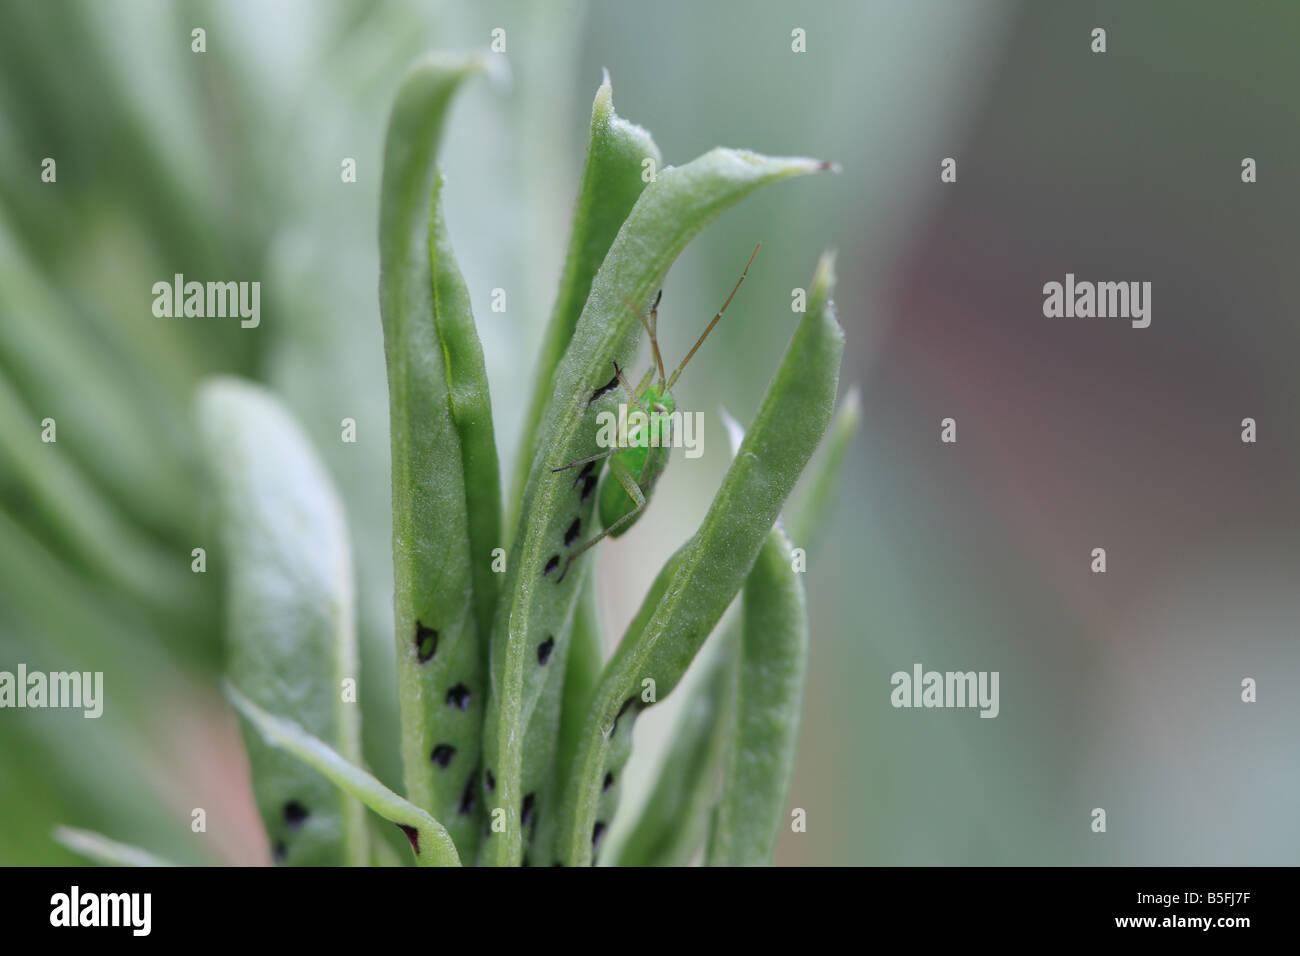 COMMON GREEN CAPSID Lygocoris pabulinus NYMPH ON BROAD BEAN SHOOT - Stock Image